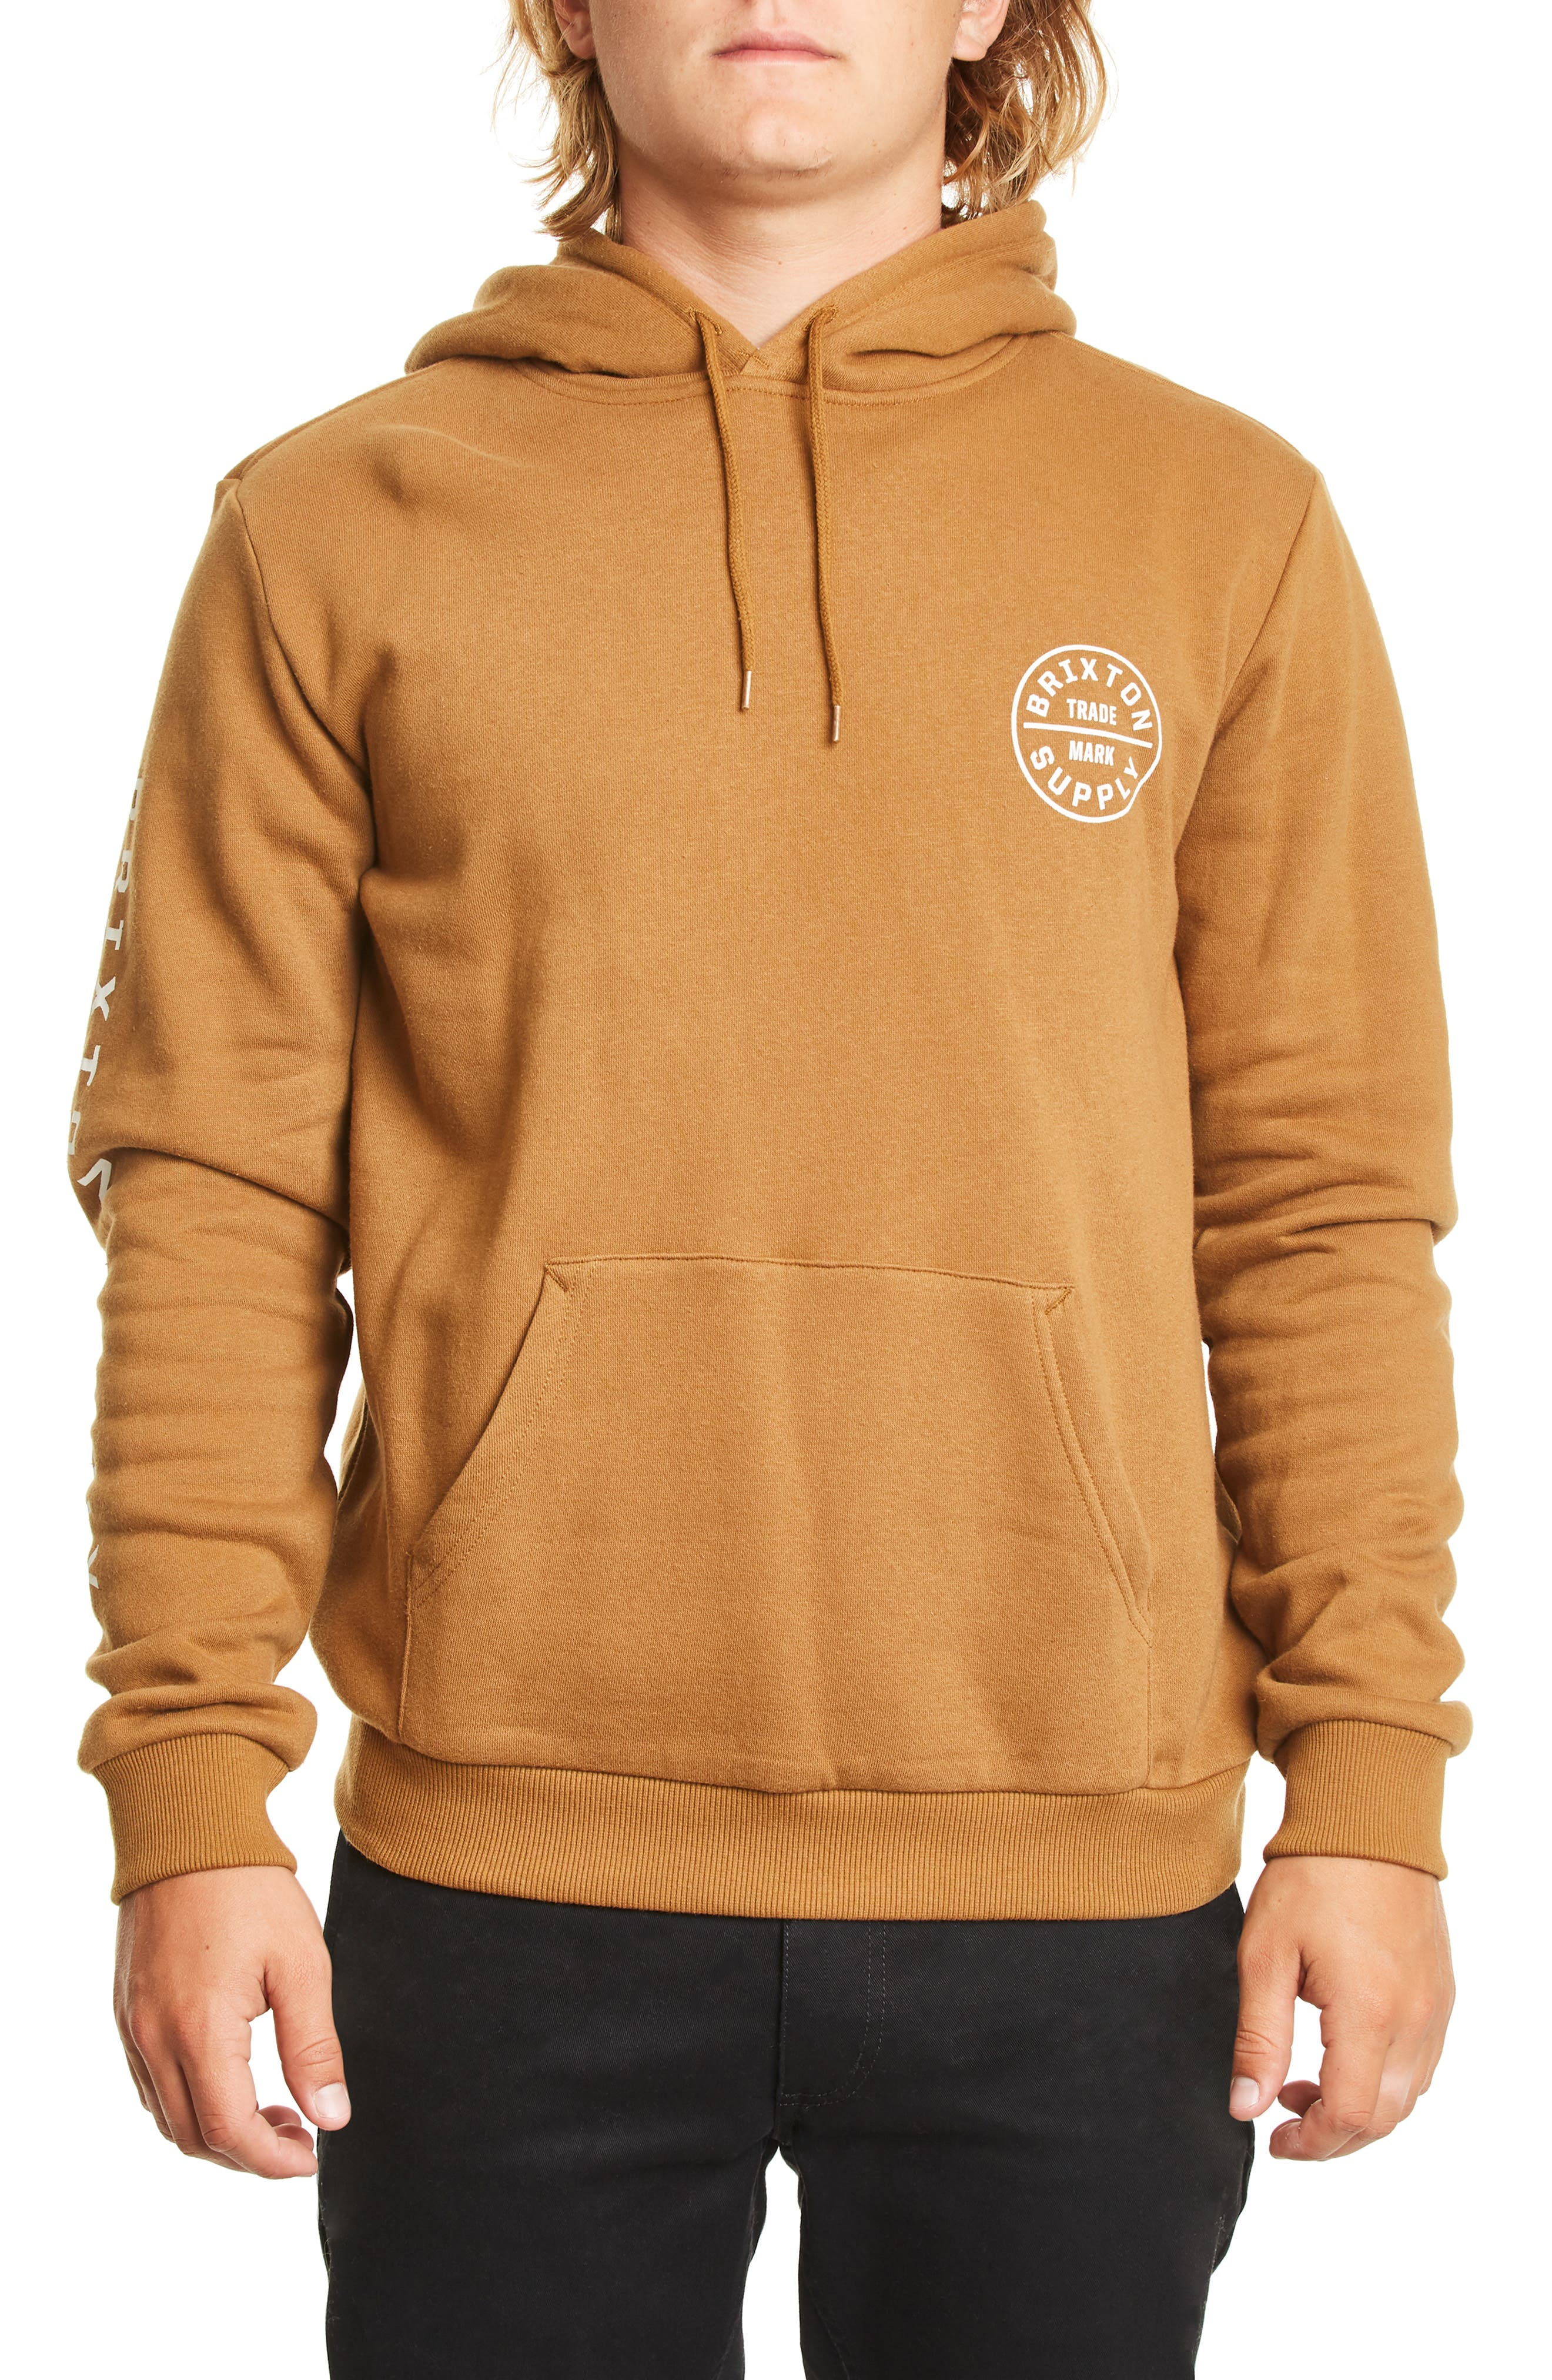 Brixton Oath Ii Hooded Sweatshirt, Brown